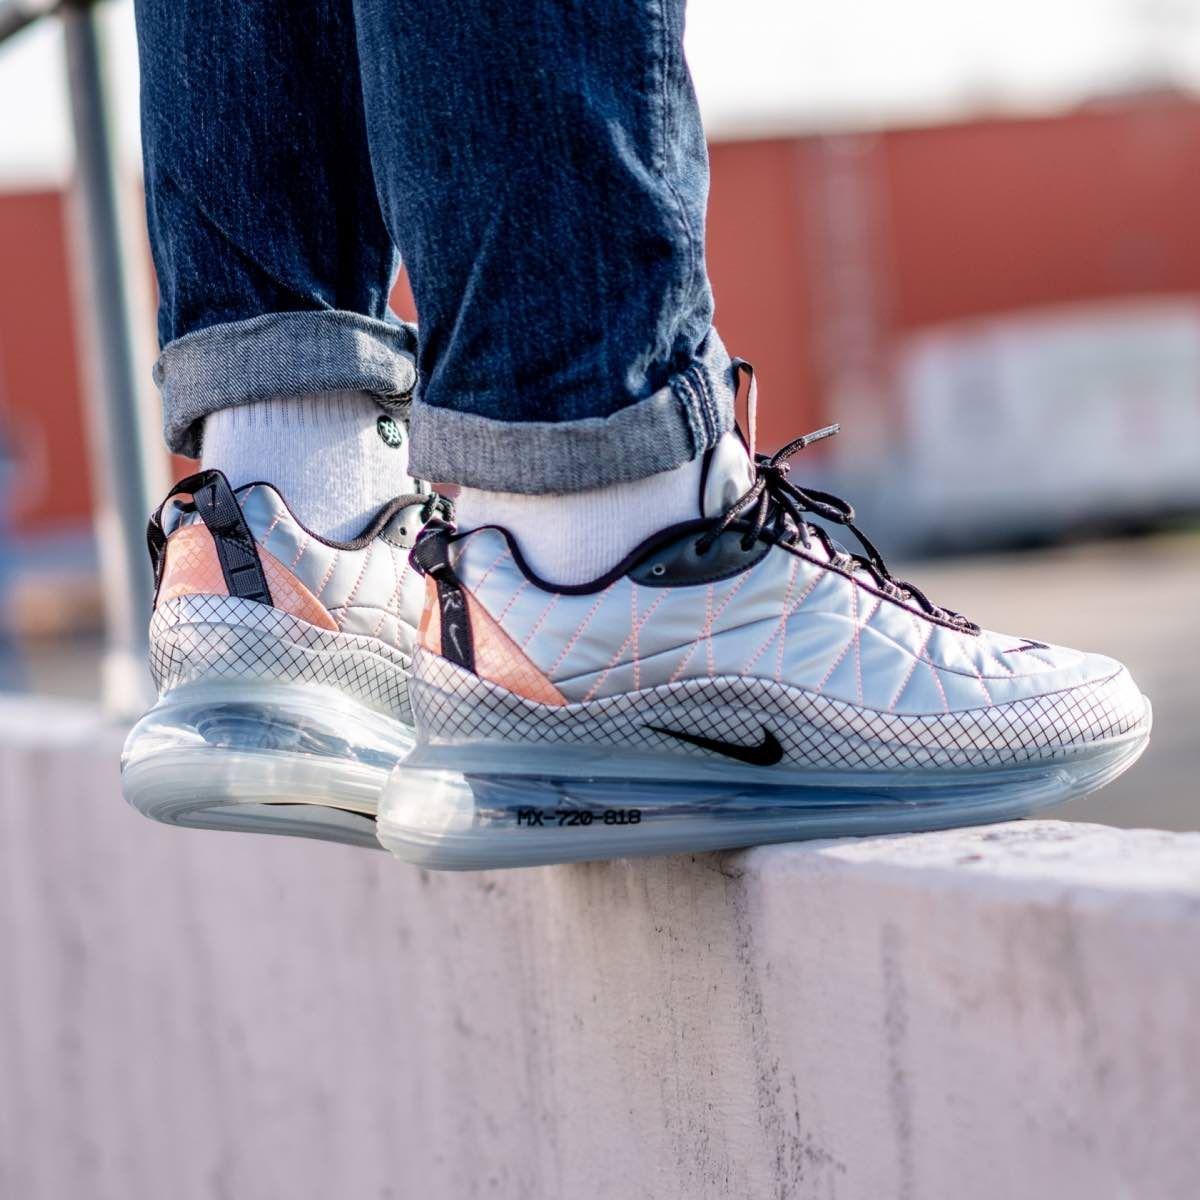 Nike Mx 720 818 Metallic Silver In 2020 Nike Sneakers Men Latest Sneakers